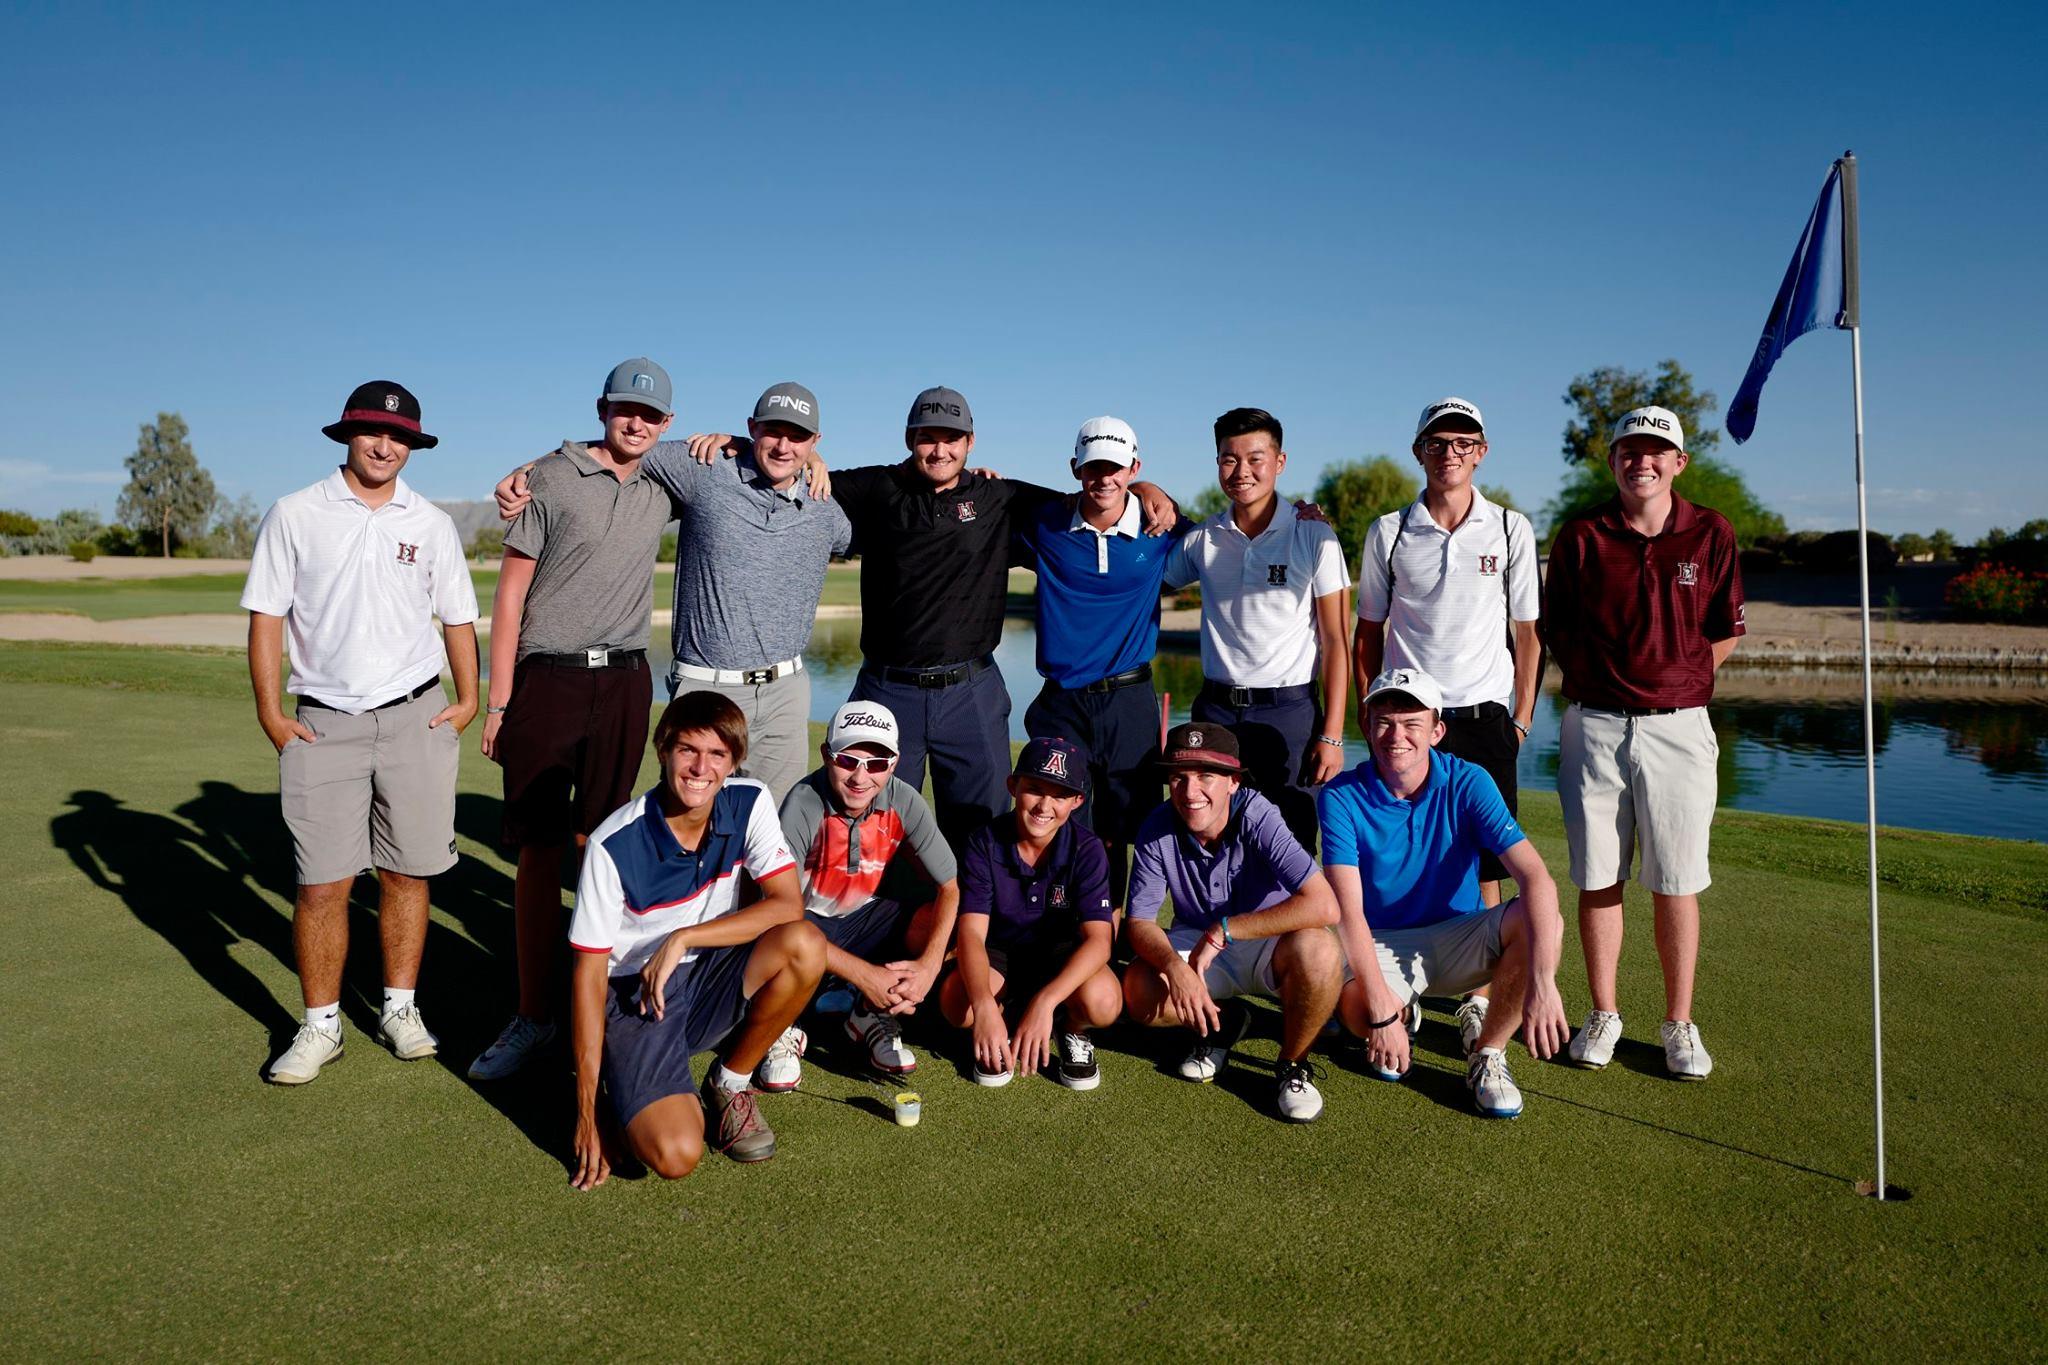 2017-2018 Boys Varsity Golf Team Roster  Nick Hedman (12)*  Ryan Sanchez (12)  TJ Reitano (12)  Alexander Yu (11)  Brandon Hill (11)  Caden Rice (11)  Calum Dunn (11)  Jacob Trevino (11)  Kanoah Cunningham (11)  Noah Bates (11)  Dalton Marsh (10)  Ethan Adam (10)  Andrew Scroggins (10)  Cole Sledge (9)  *playing in FL tournament when photo was taken